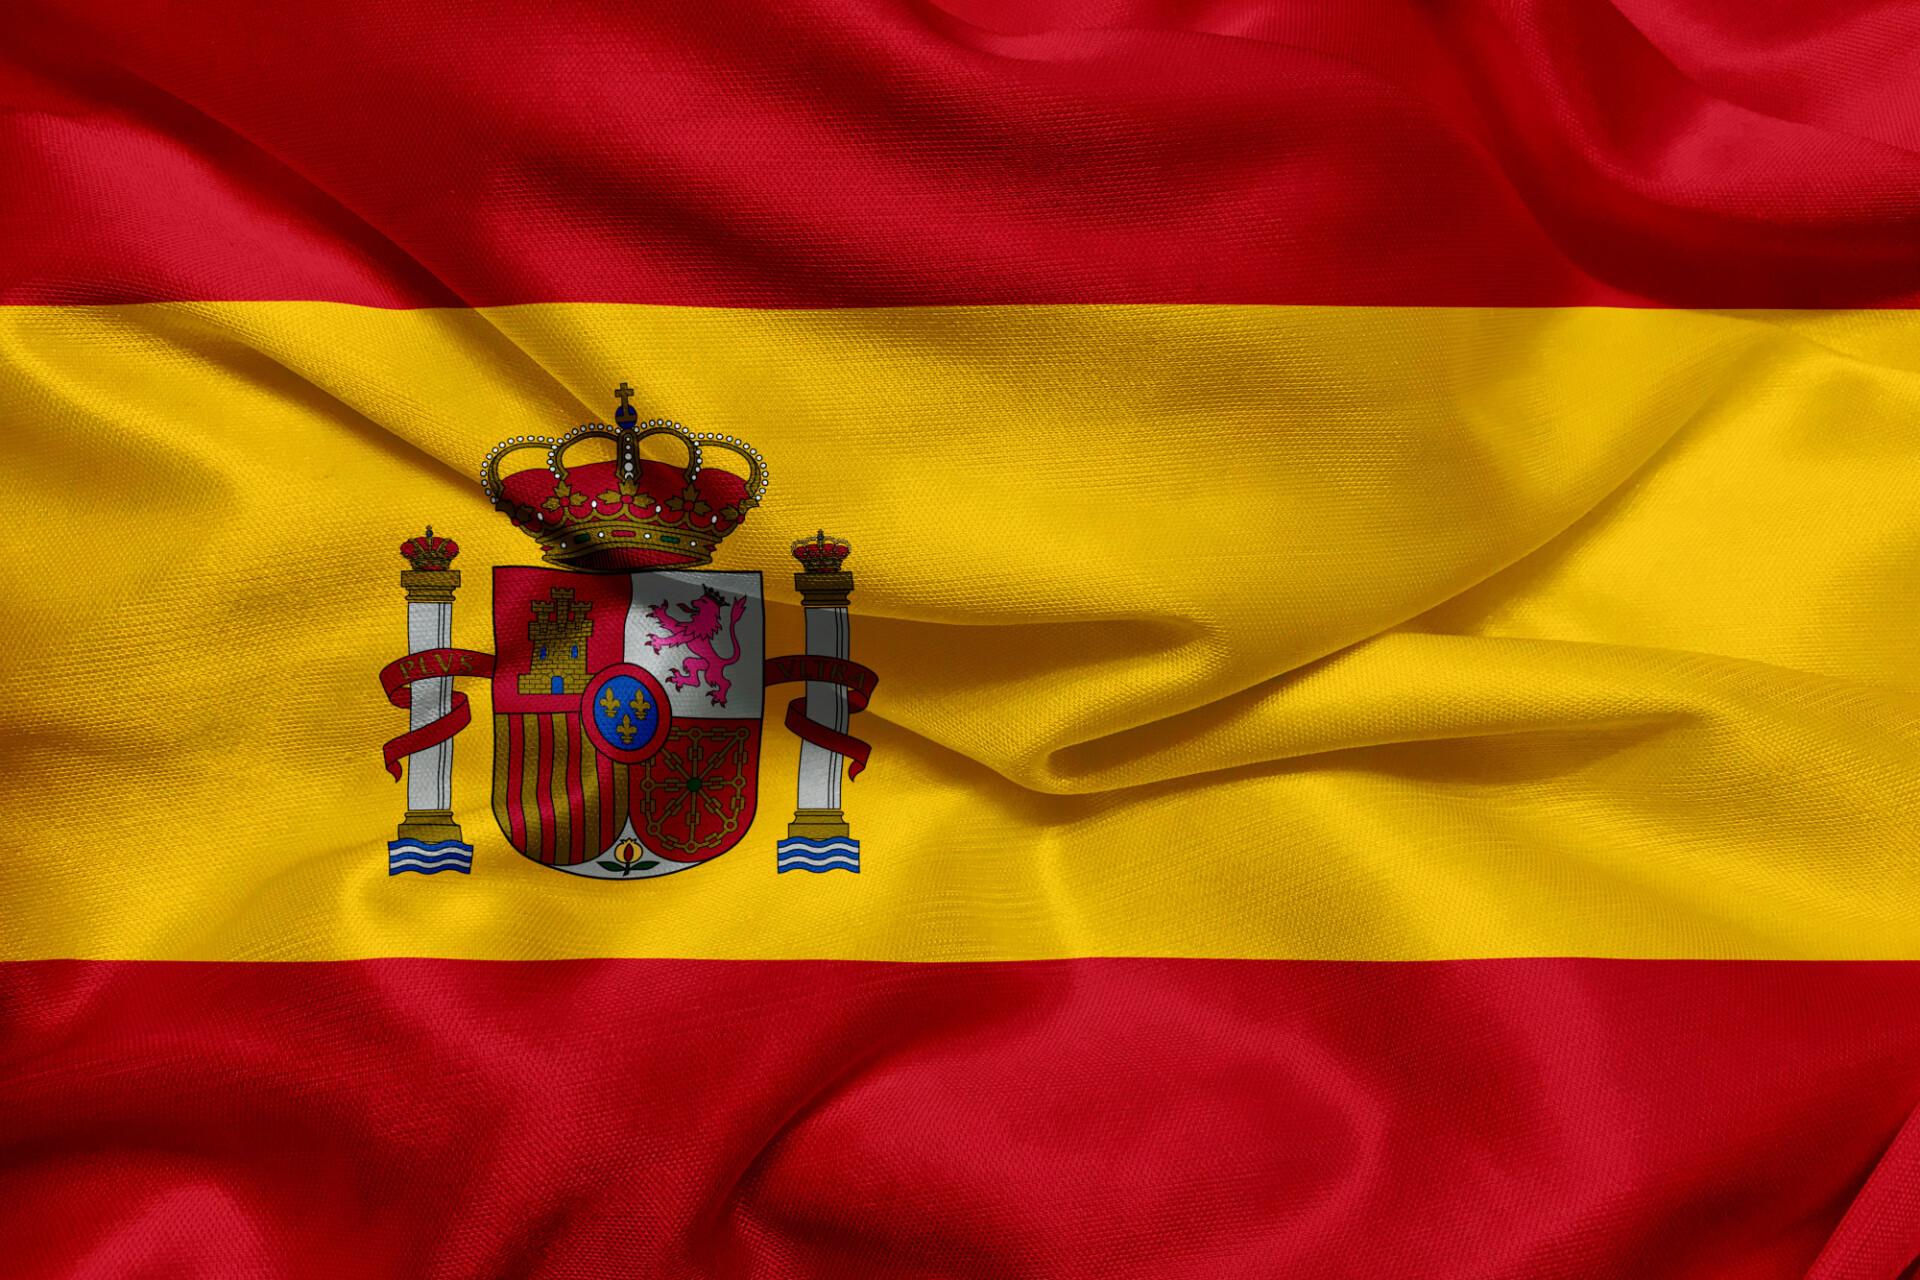 Flag of Spain - the rojigualda